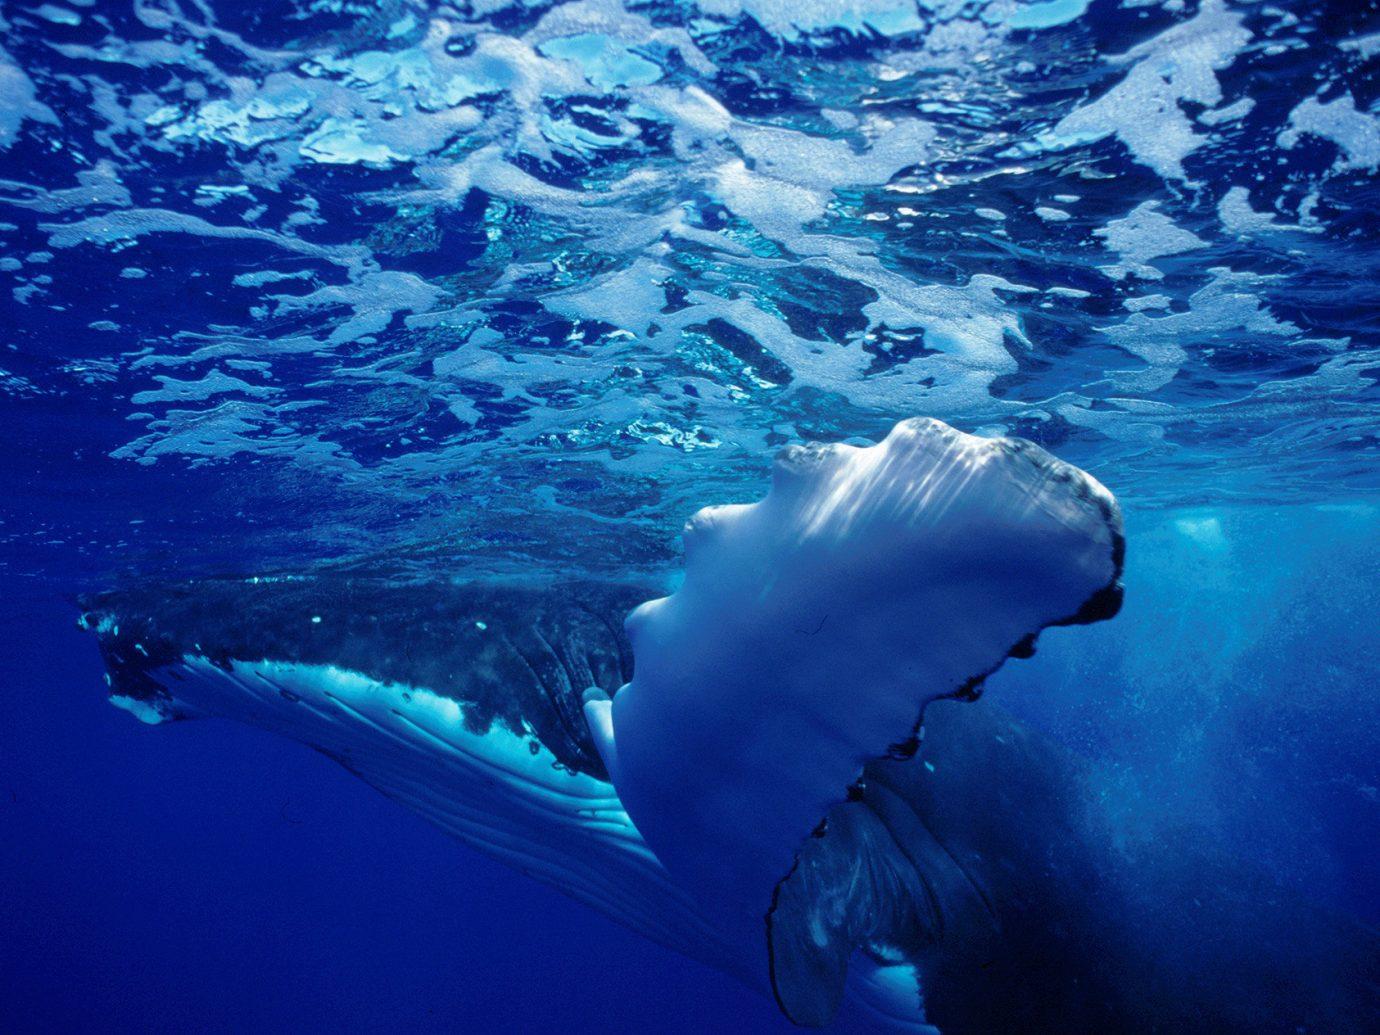 Islands Trip Ideas mammal vertebrate marine biology Ocean marine mammal biology whales dolphins and porpoises humpback whale whale Sea underwater common bottlenose dolphin ocean floor